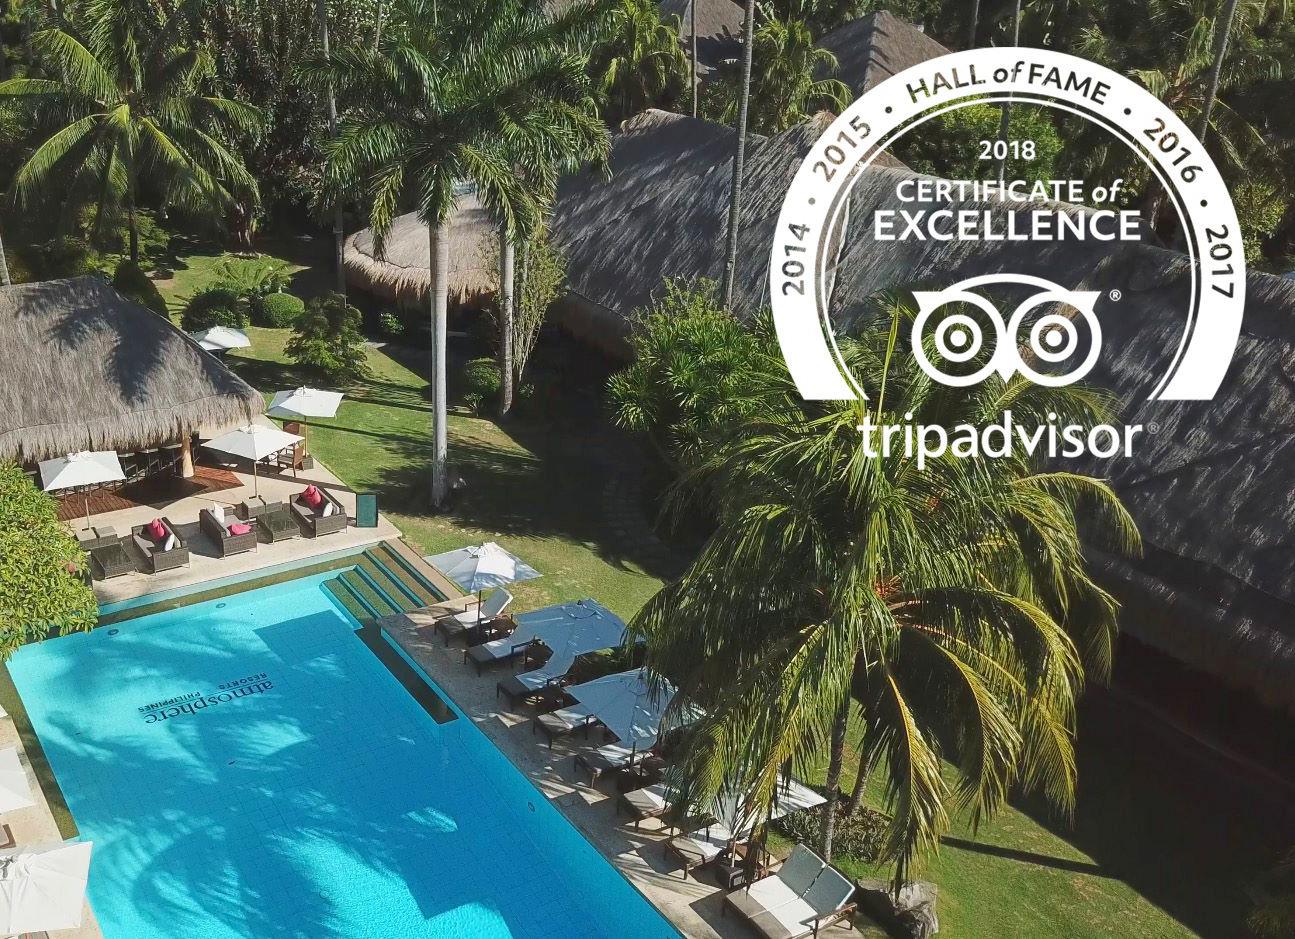 Atmosphere Resorts - Tripadvisor Hall of Fame